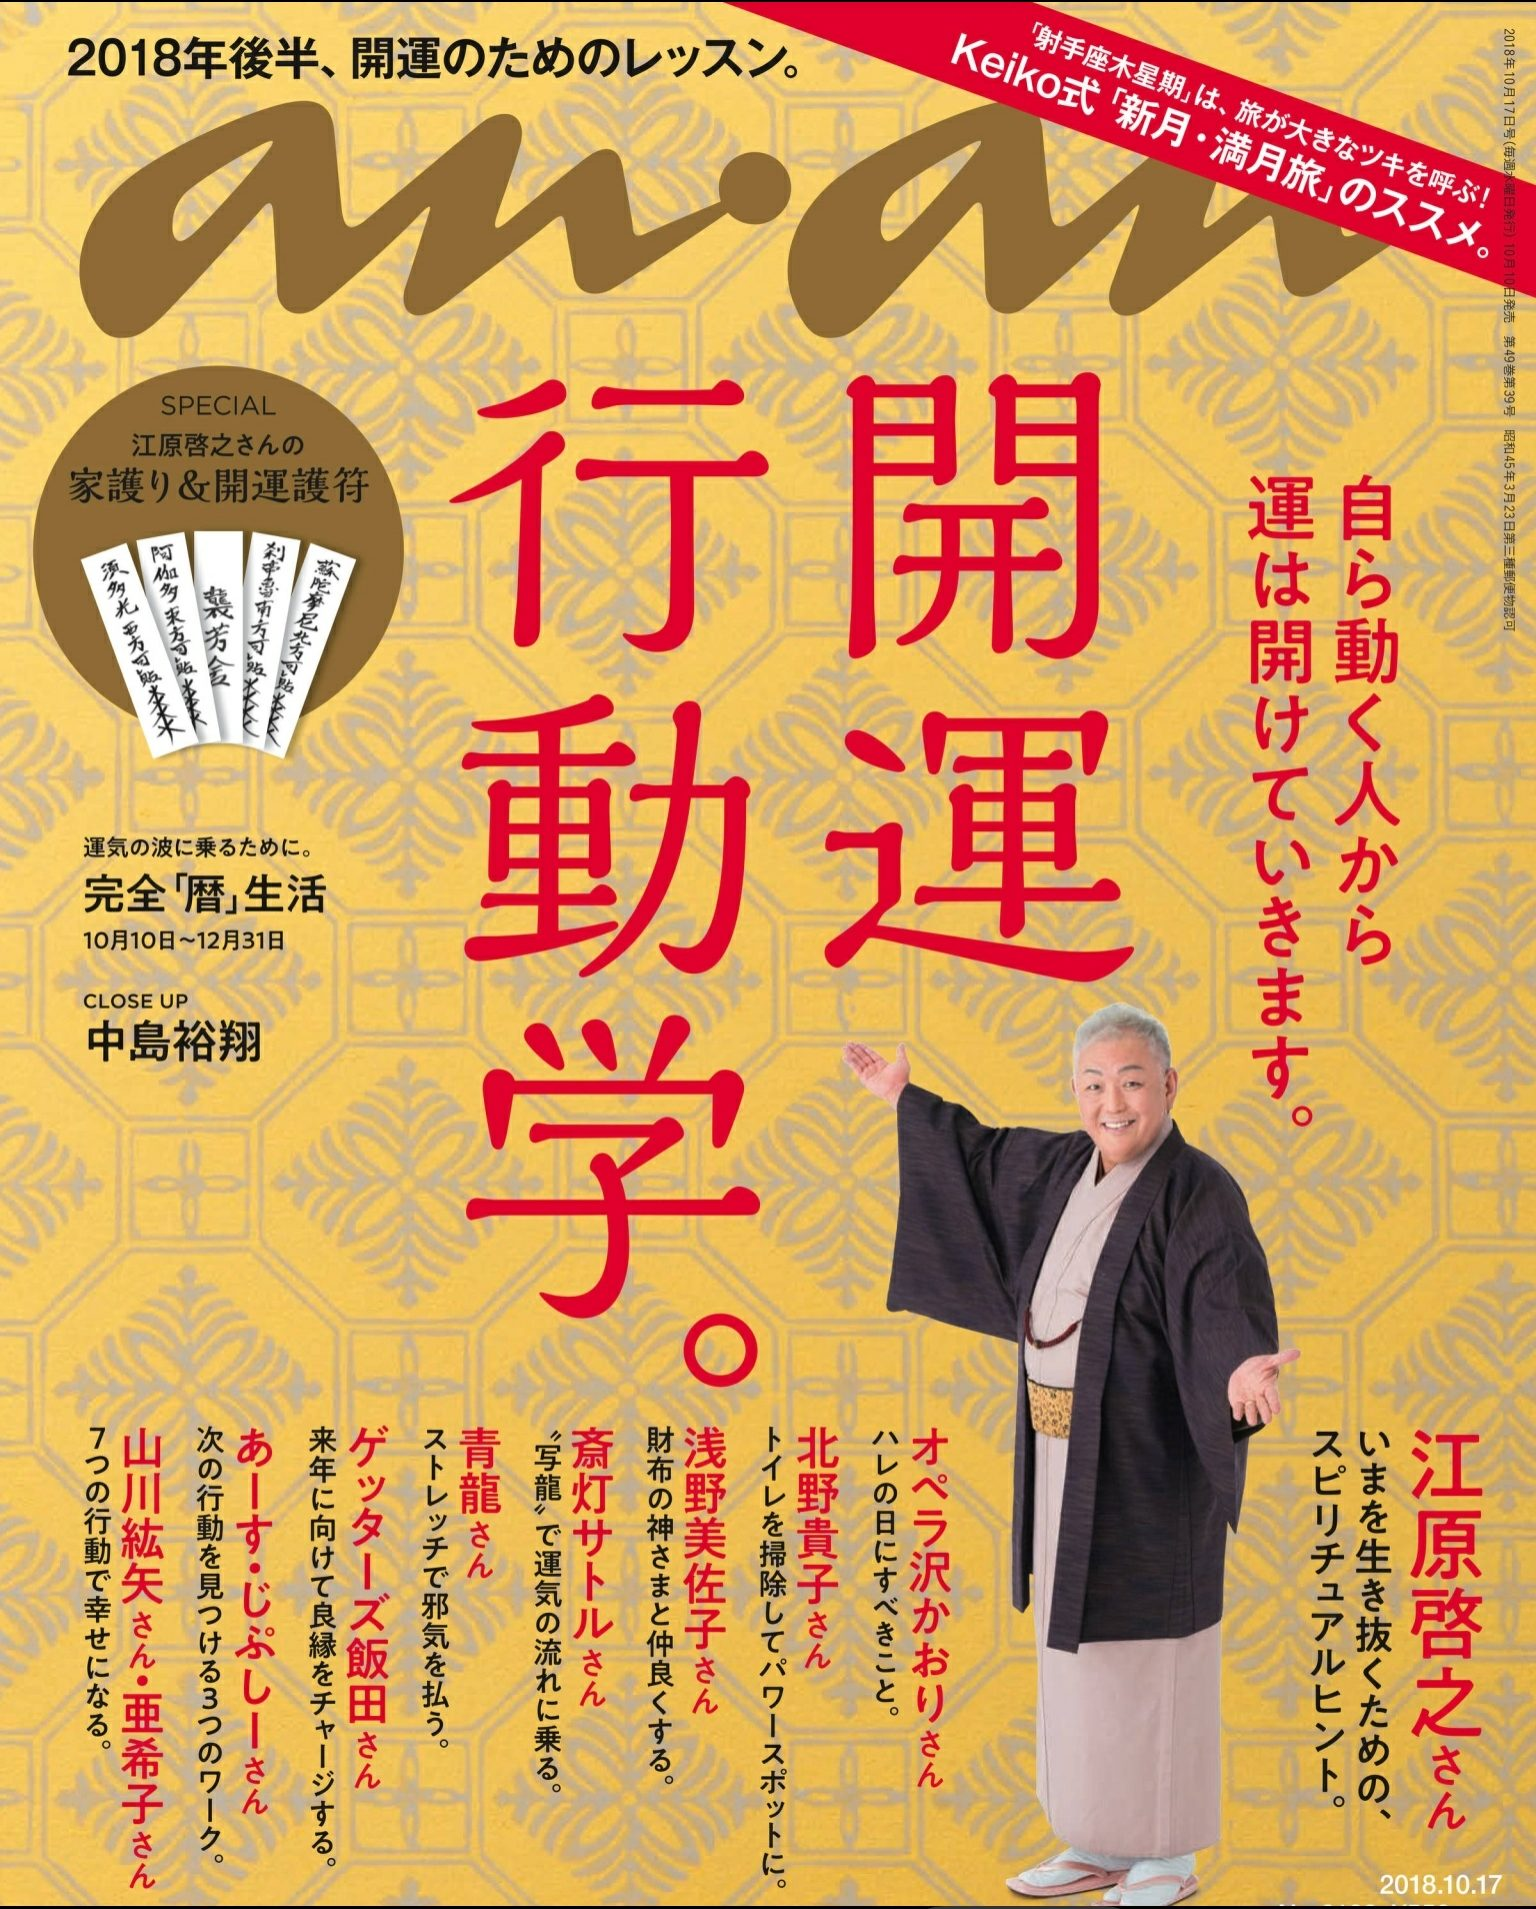 『anan』2018.10.17号(No.2122)表紙